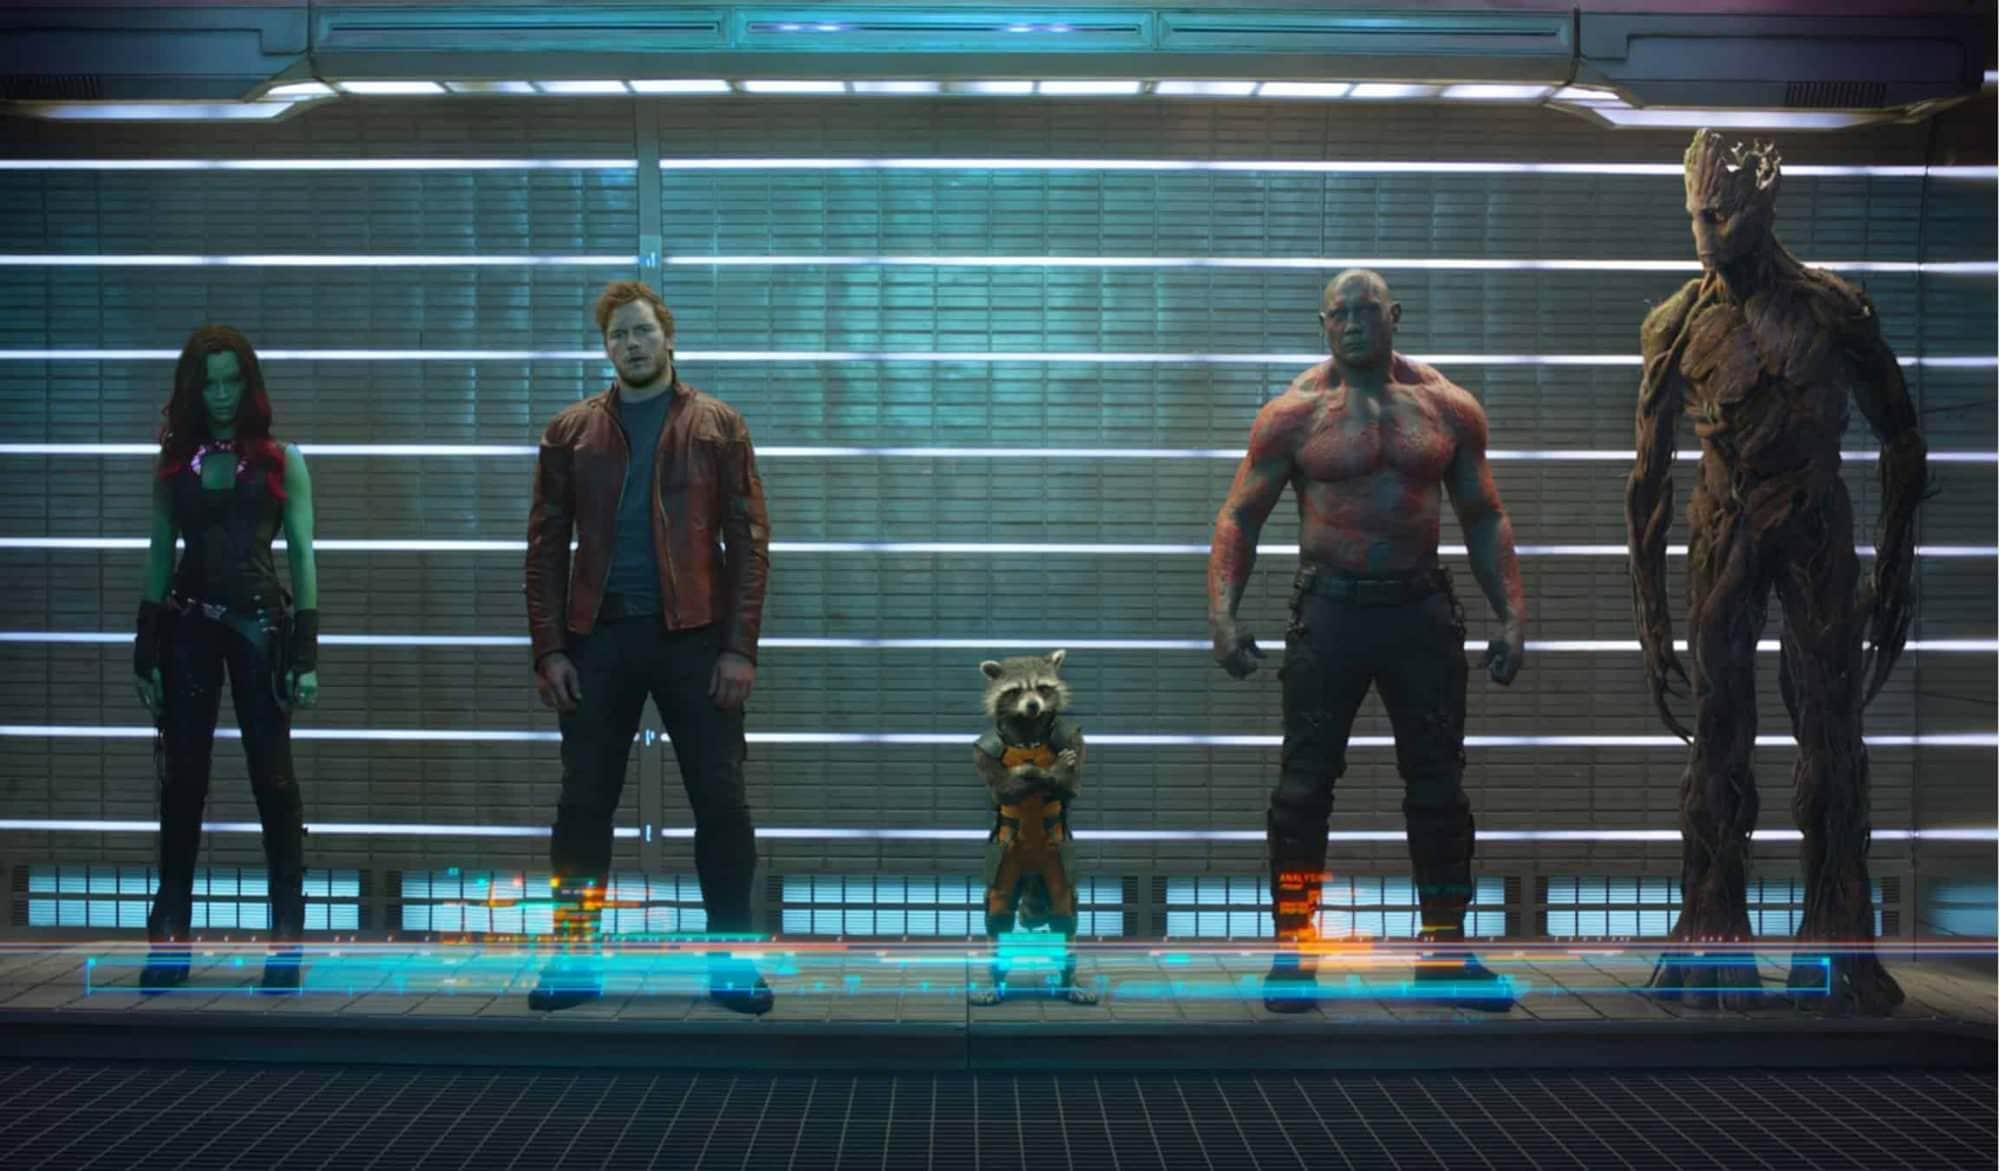 Disney จ้าง James Gunn กลับมากำกับ GUARDIANS OF THE GALAXY VOL. 3 อีกครั้ง 2